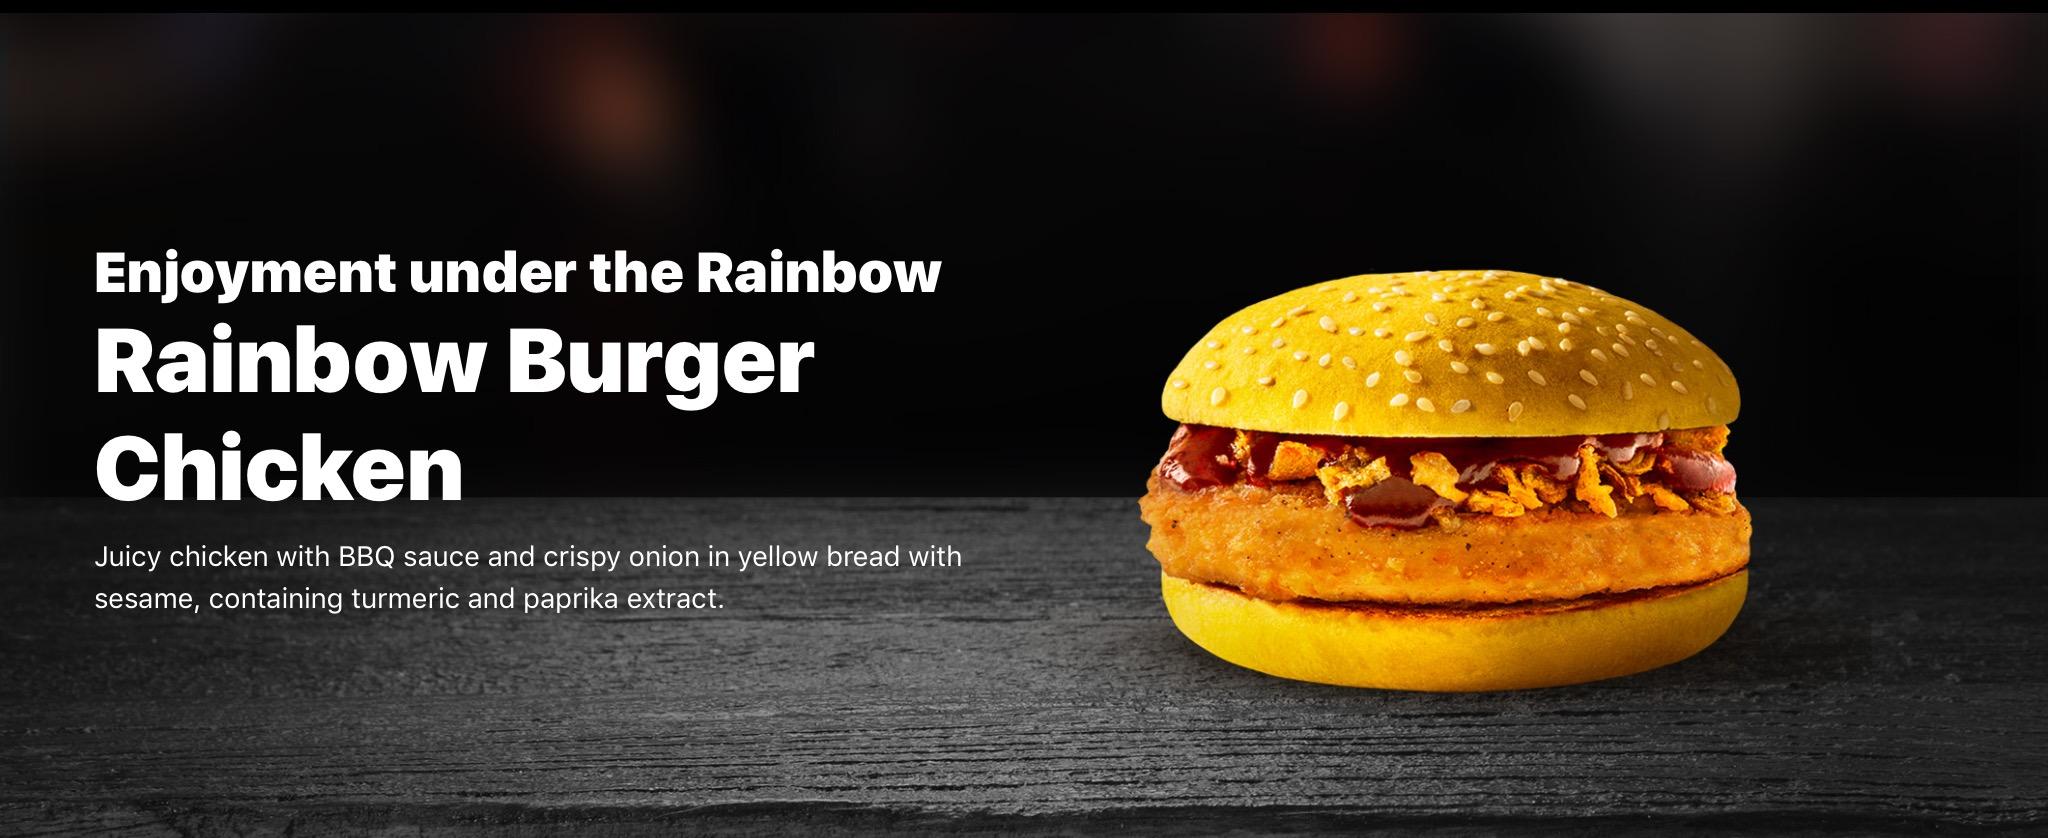 McDonald's Rainbow Burger Chicken